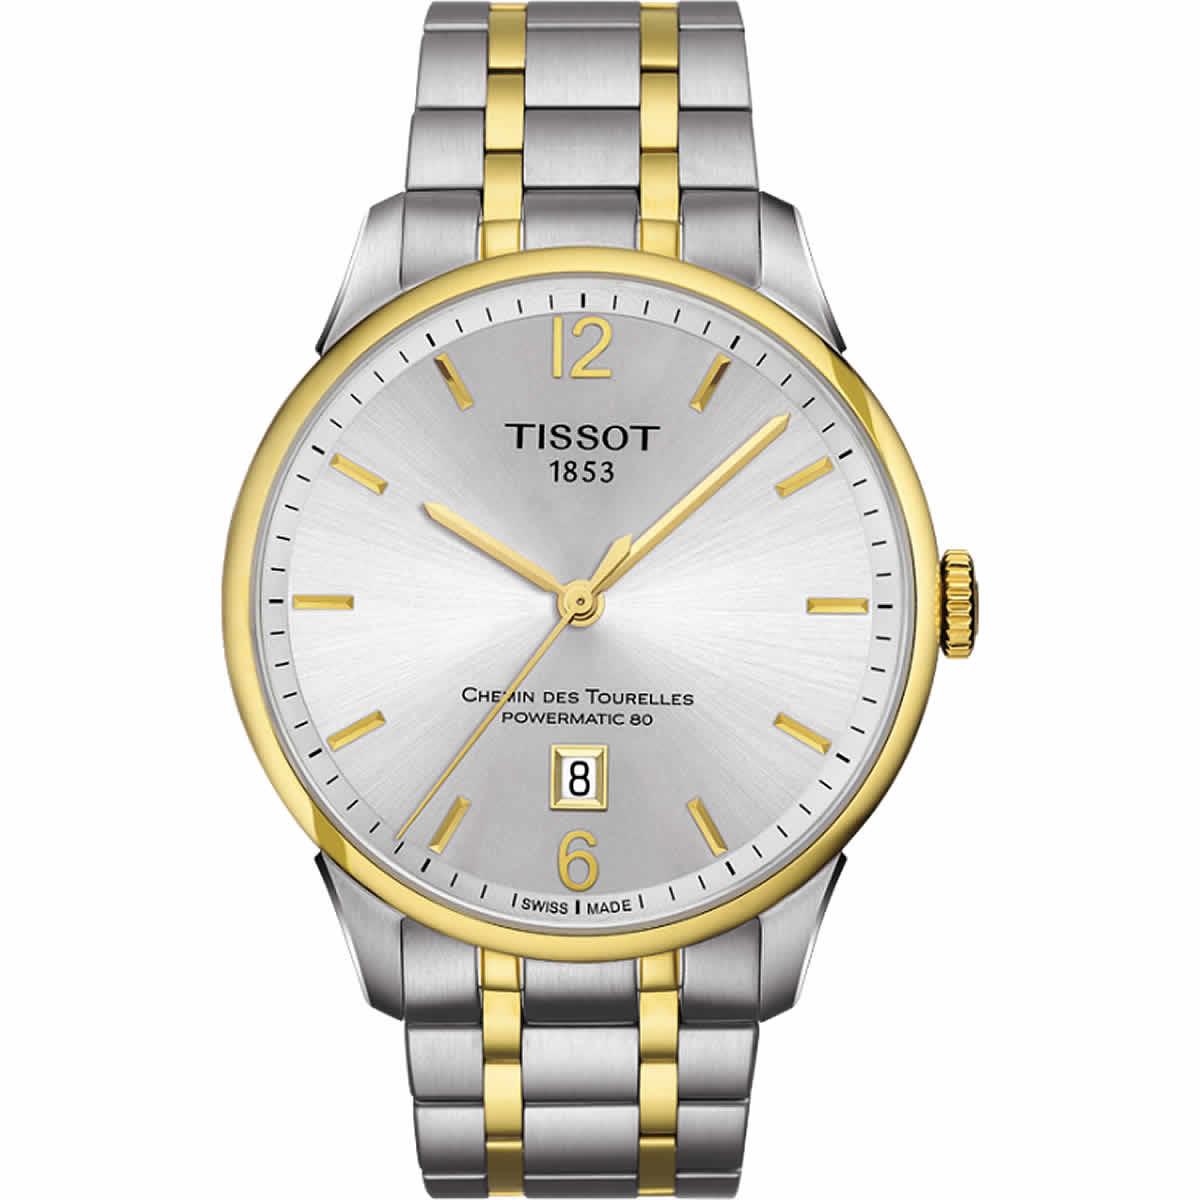 Tissot(ティソ) CHEMIN DES TOURELLES  (シャミン・ド・トゥレル )t0994072203700